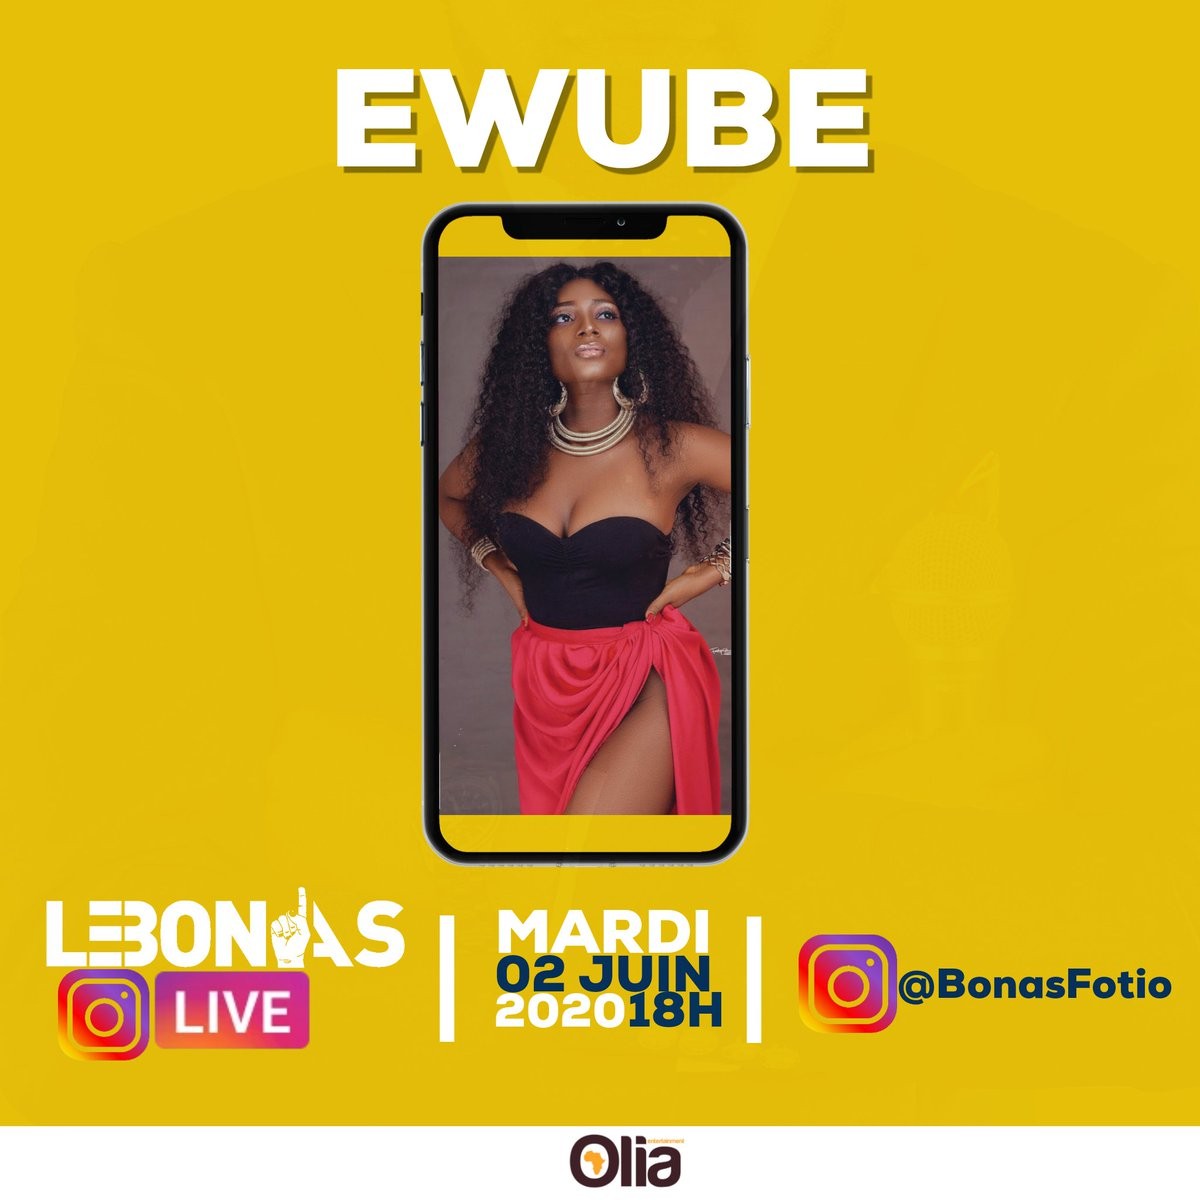 Ce soir, #LeBonAsLive sur Instagram avec Bonas Fotio et @Its_Ewube. Vibes afro-dancehall en vue ! 🔥  #LeBonAs https://t.co/yC4LydZIMe